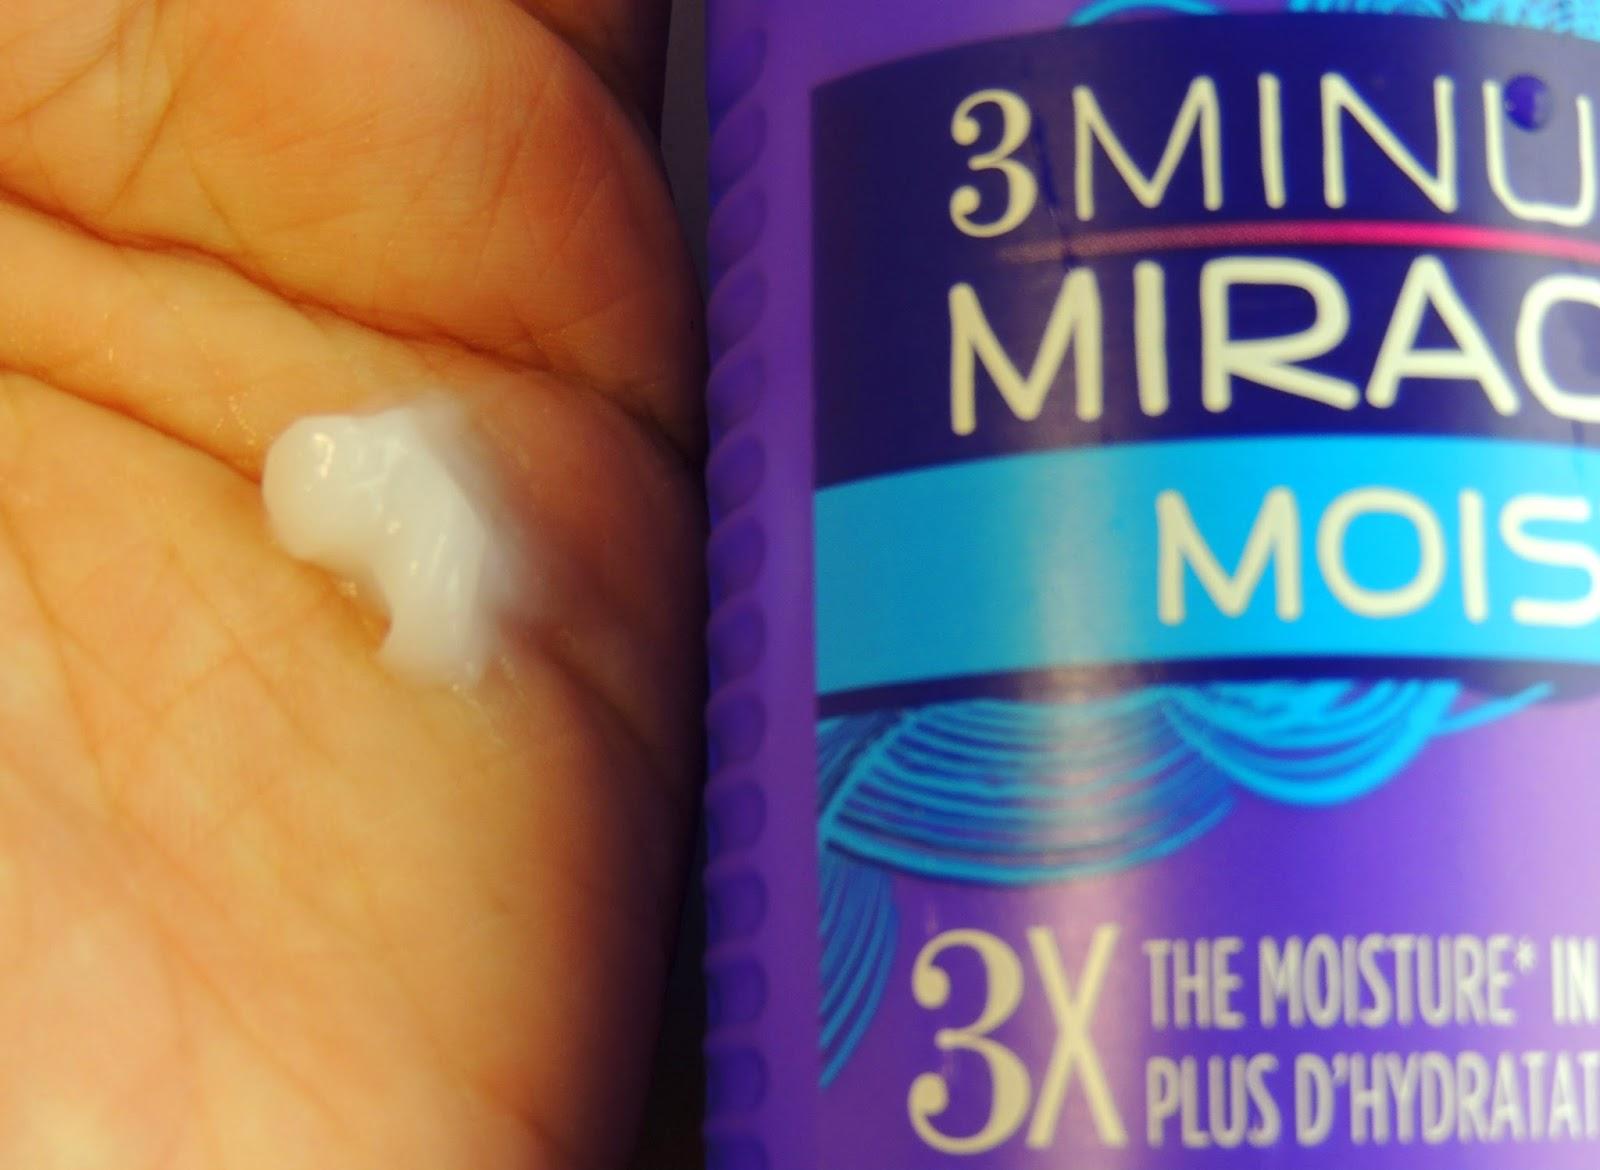 Resenha: Condicionador Hidratante 3 Minute Miracle Moist -  Aussie